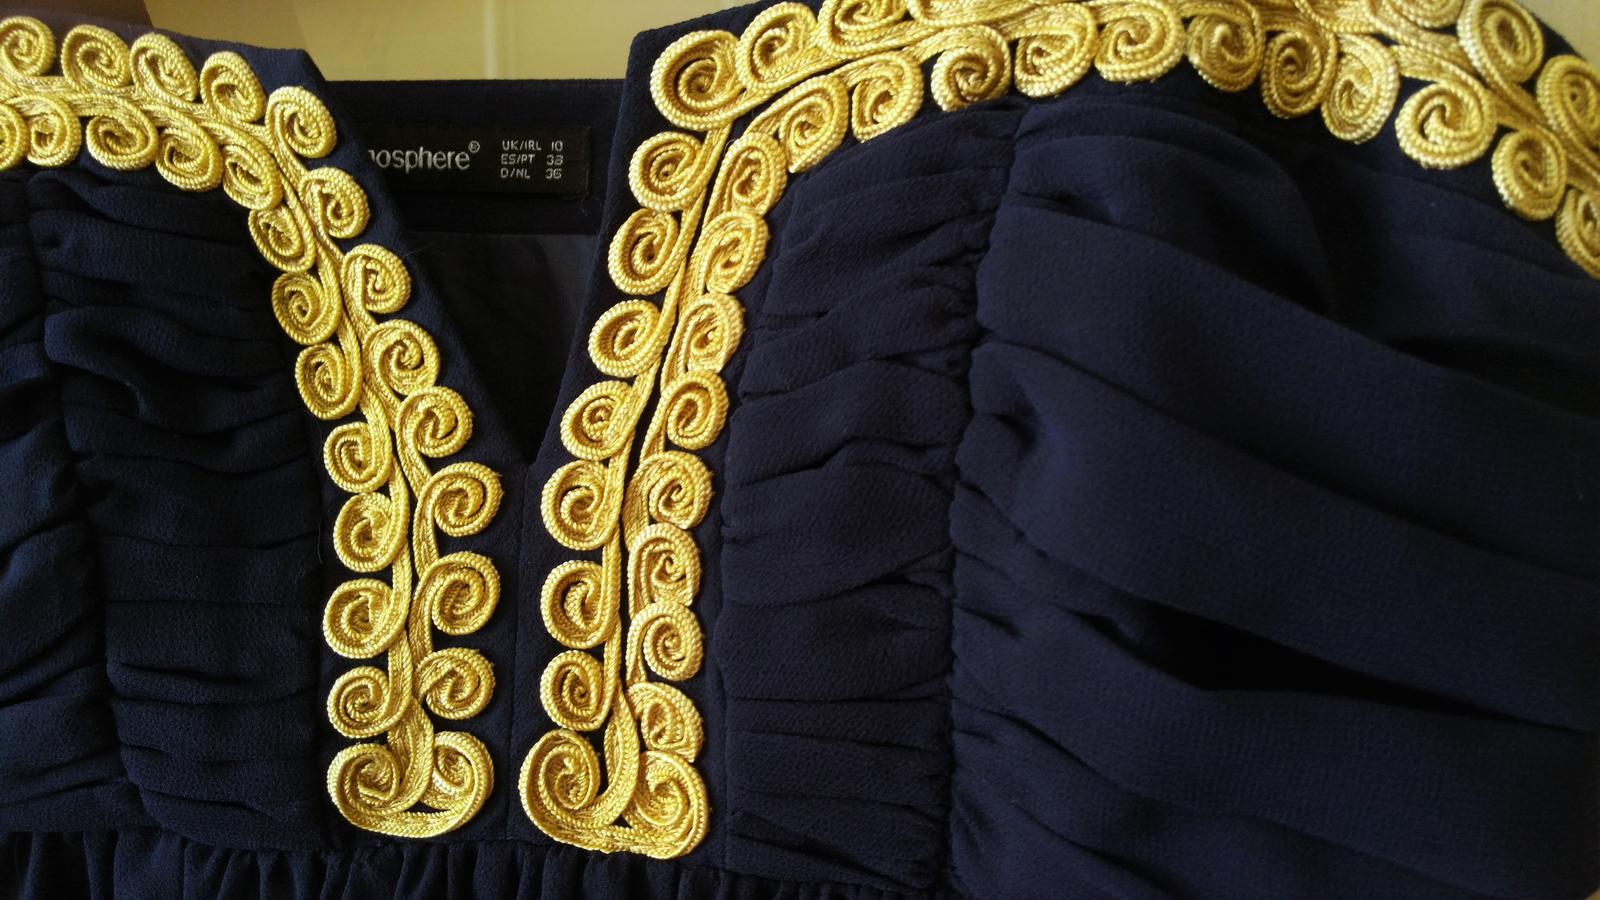 Tmavomodré elegantné šaty č.38 (M) - Obrázok č. 2